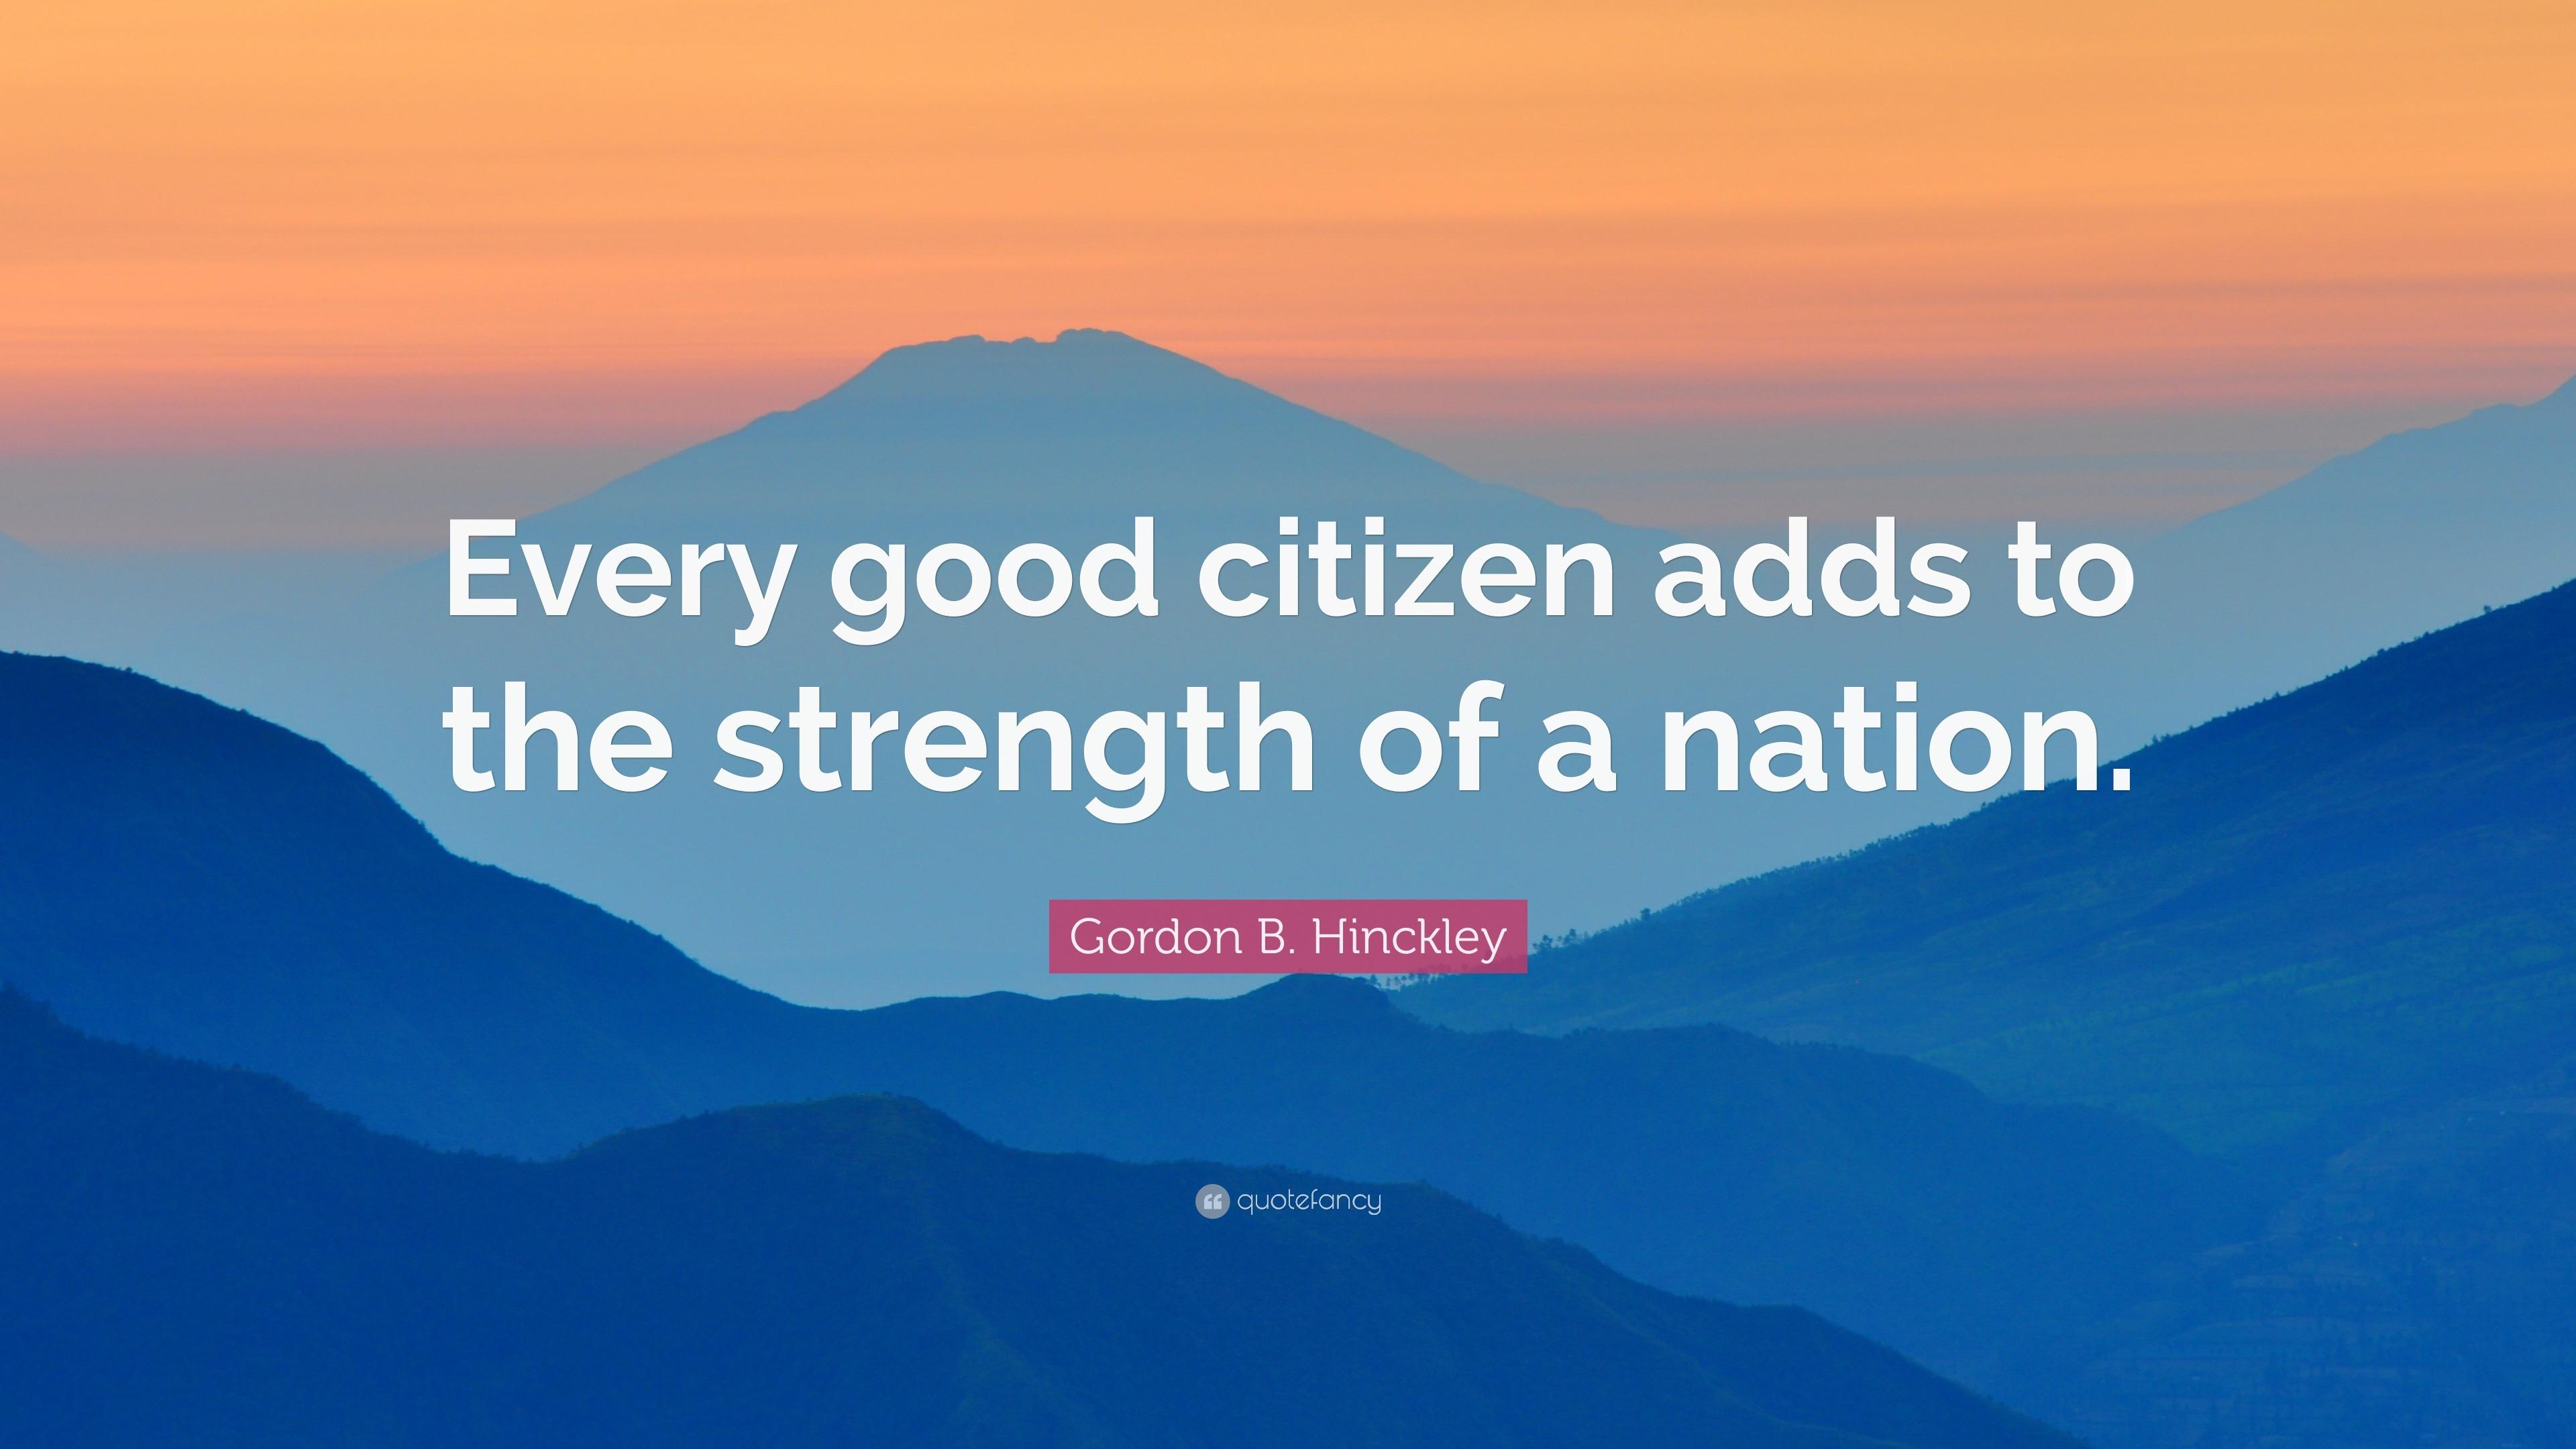 Gordon B Hinckley Quotes 100 Wallpapers